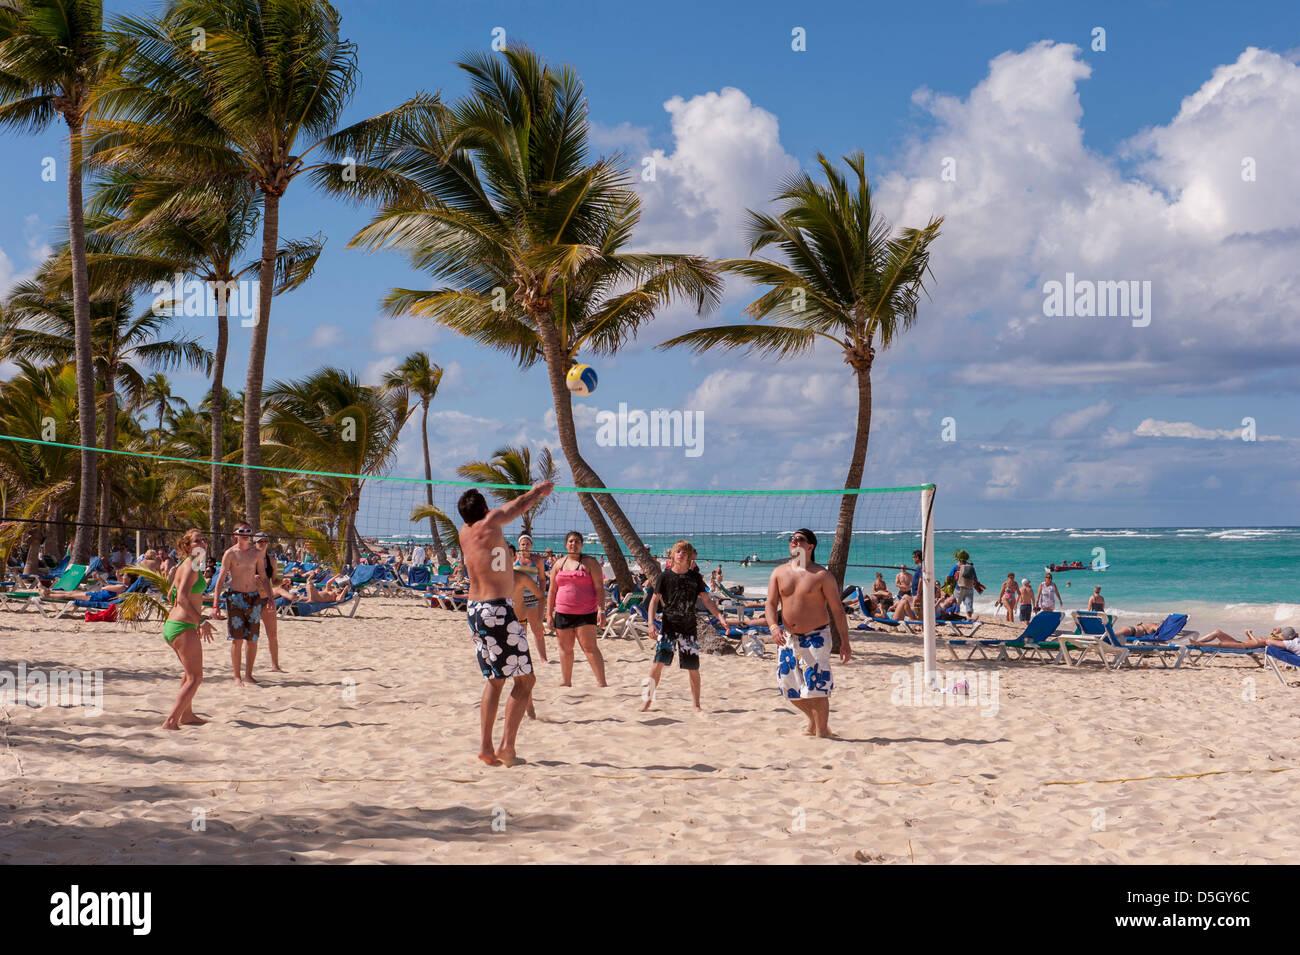 Dominican Republic Punta Cana Higuey Bavaro Riu Palace People Playing Beach Volleyball